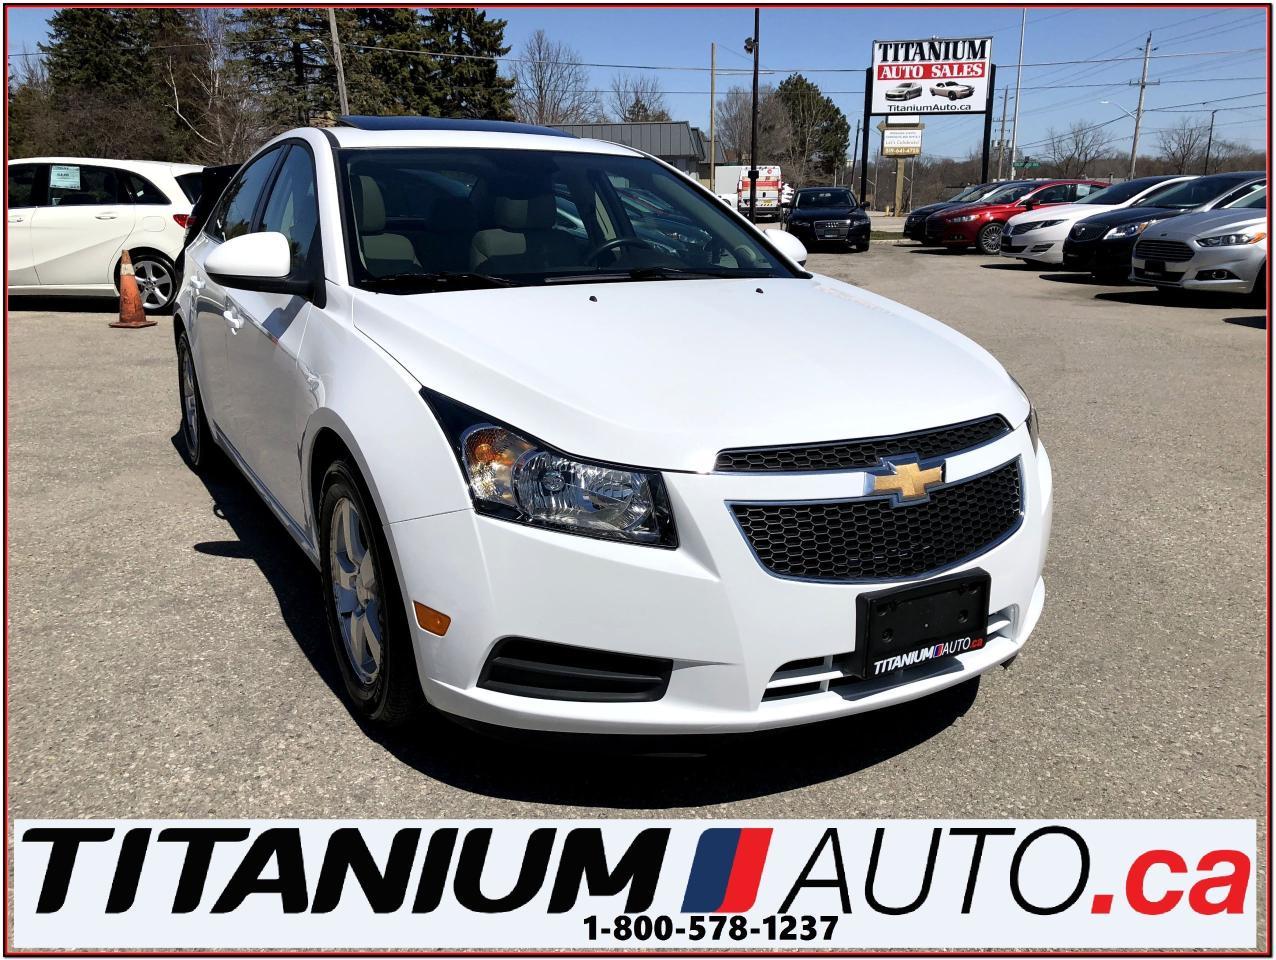 2014 Chevrolet Cruze 2-LT+Camera+Sunroof+Heated Leather Power Seat+XM++